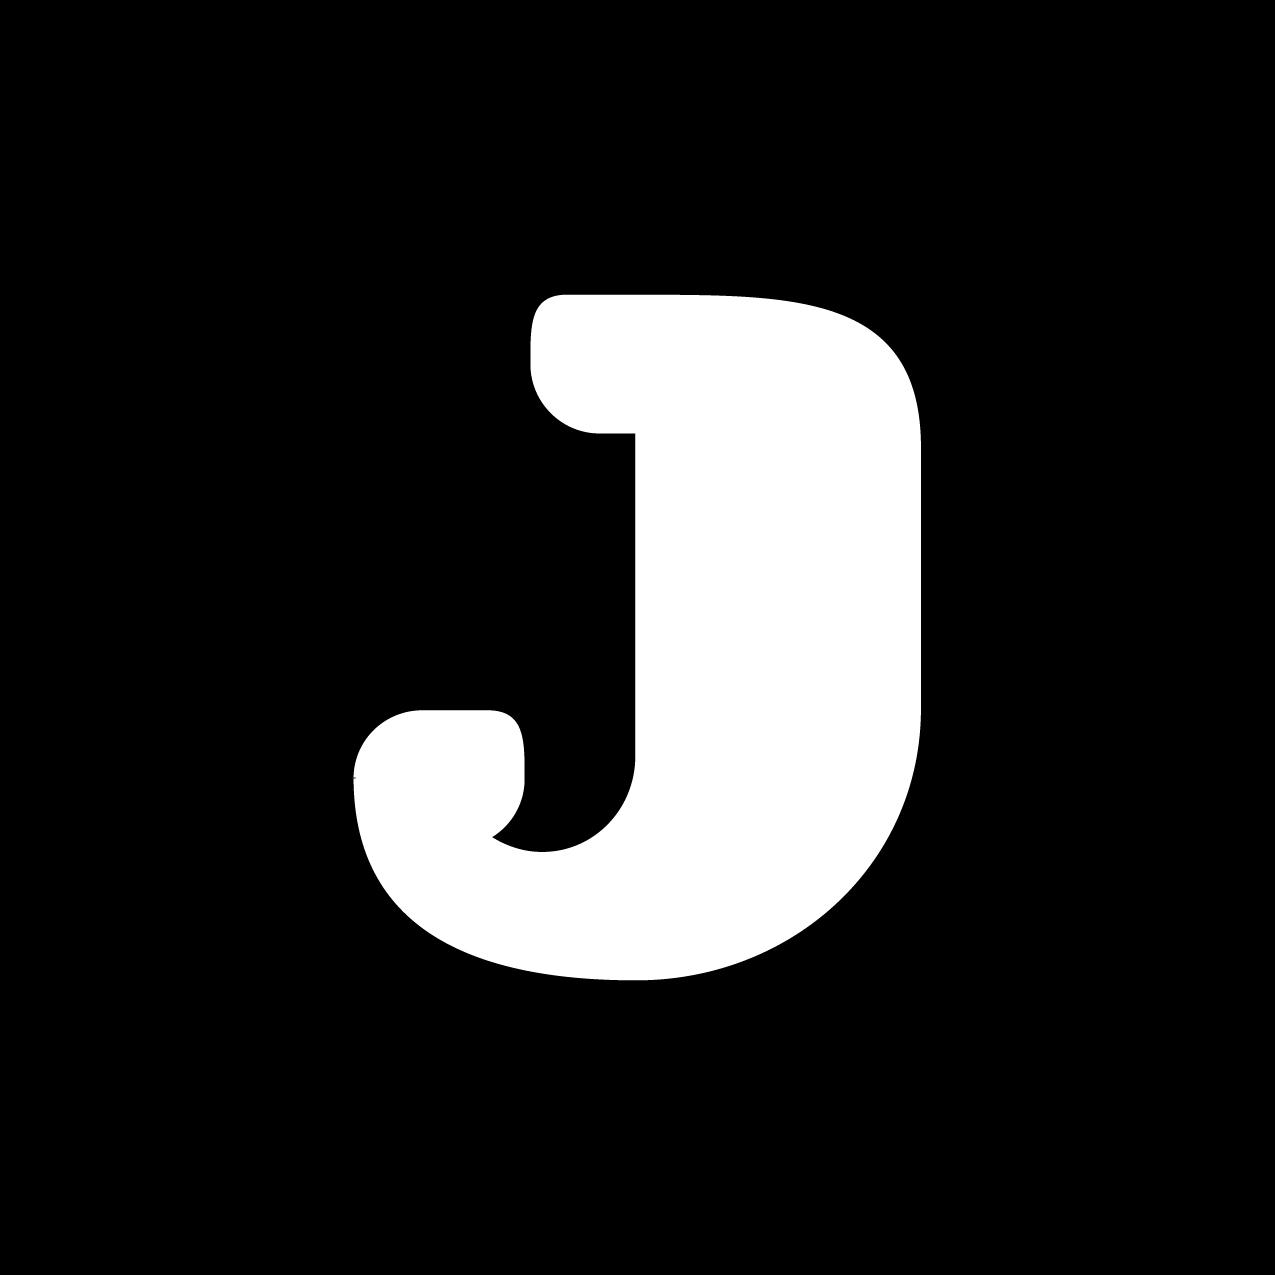 Letter J3 Design by Furia